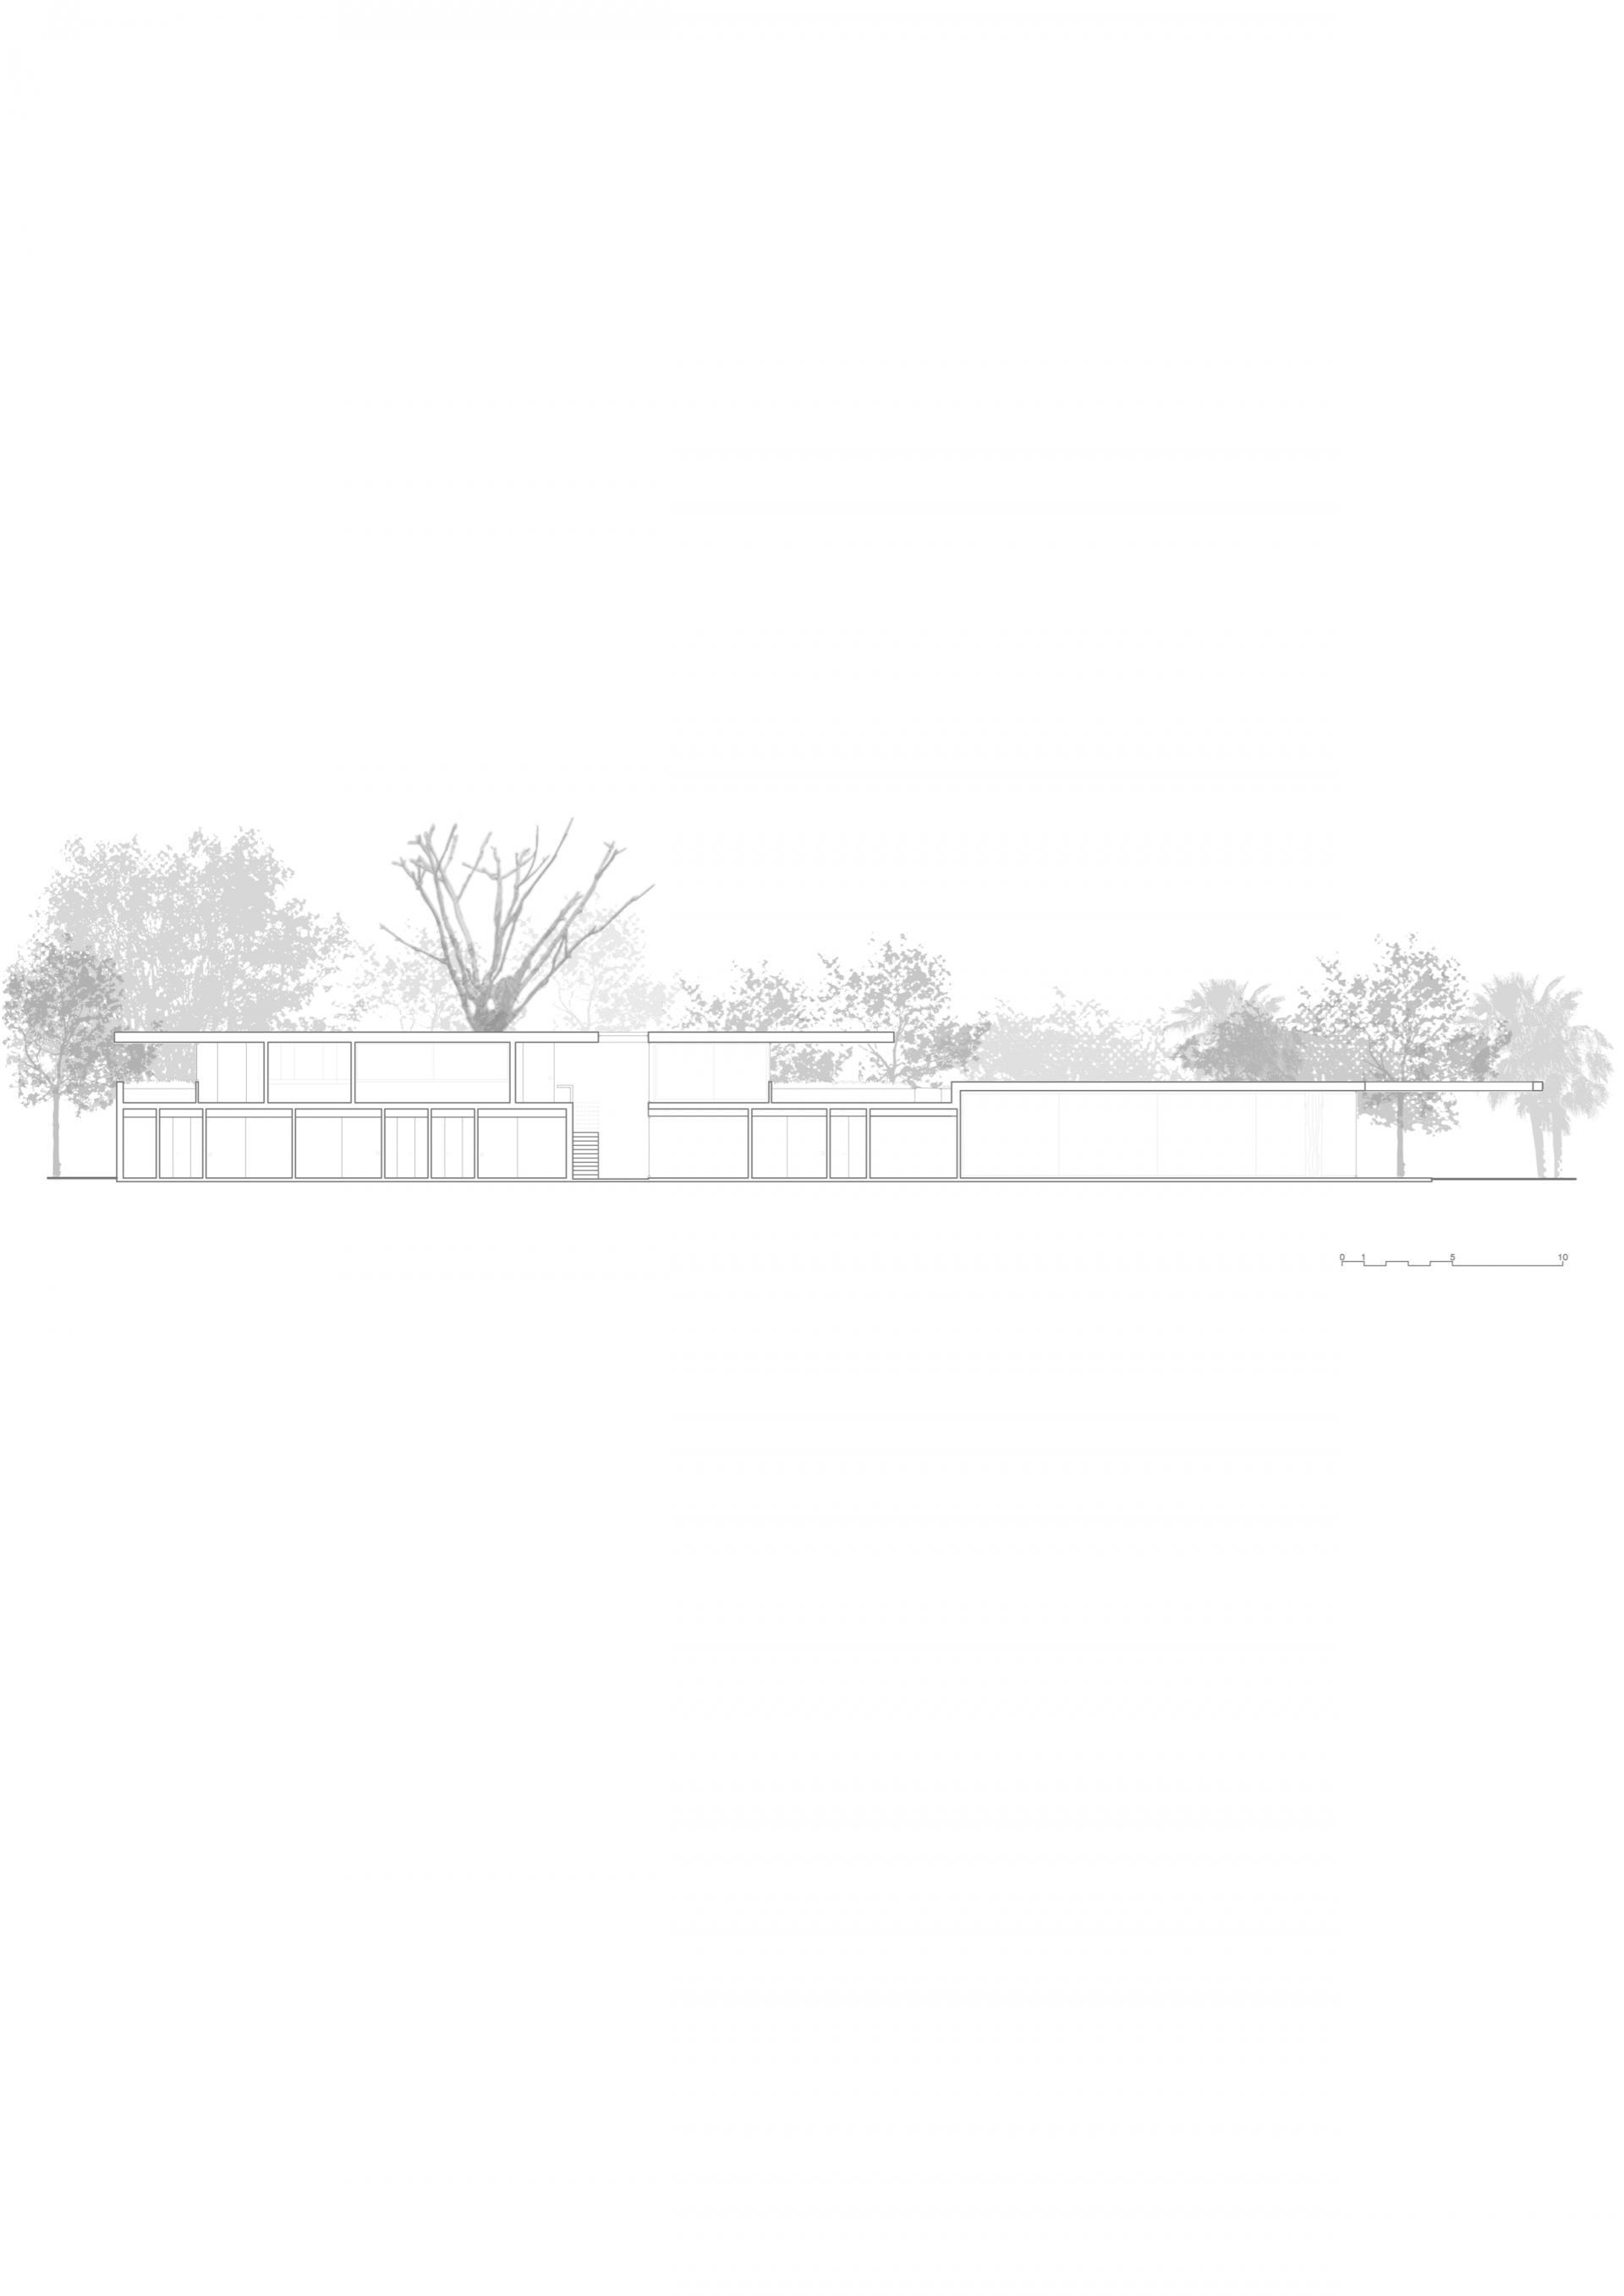 L shape ITU house near Sao Paulo by Studio Arthur Casas-23